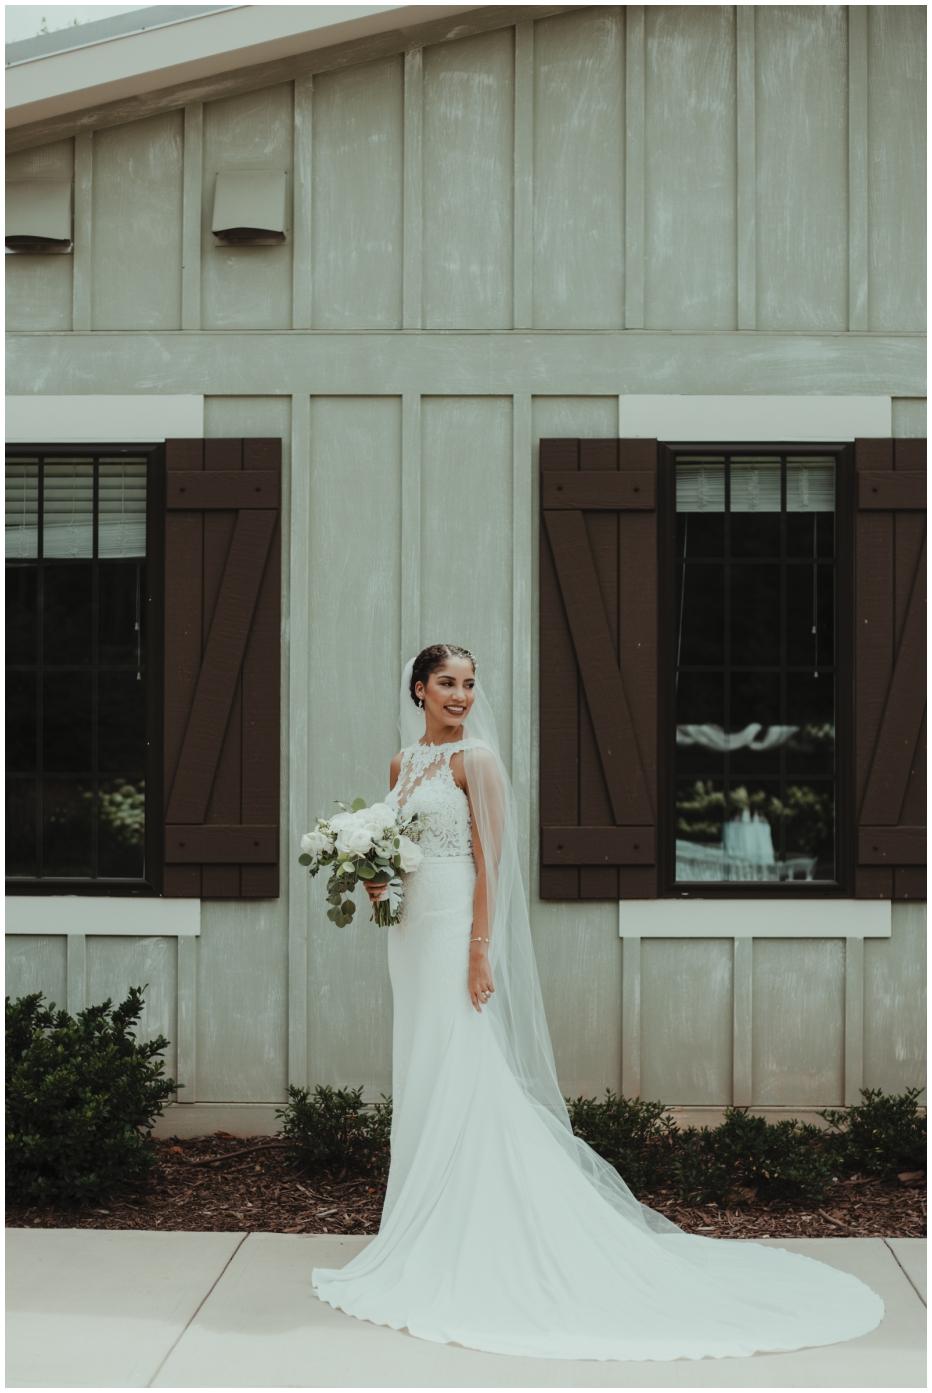 Posh-Moments-Photography-NC- Wedding-Photographer-Rolling-Hills-Farms-Wedding-Monroe-NC-Charlotte-NC_0252.jpg